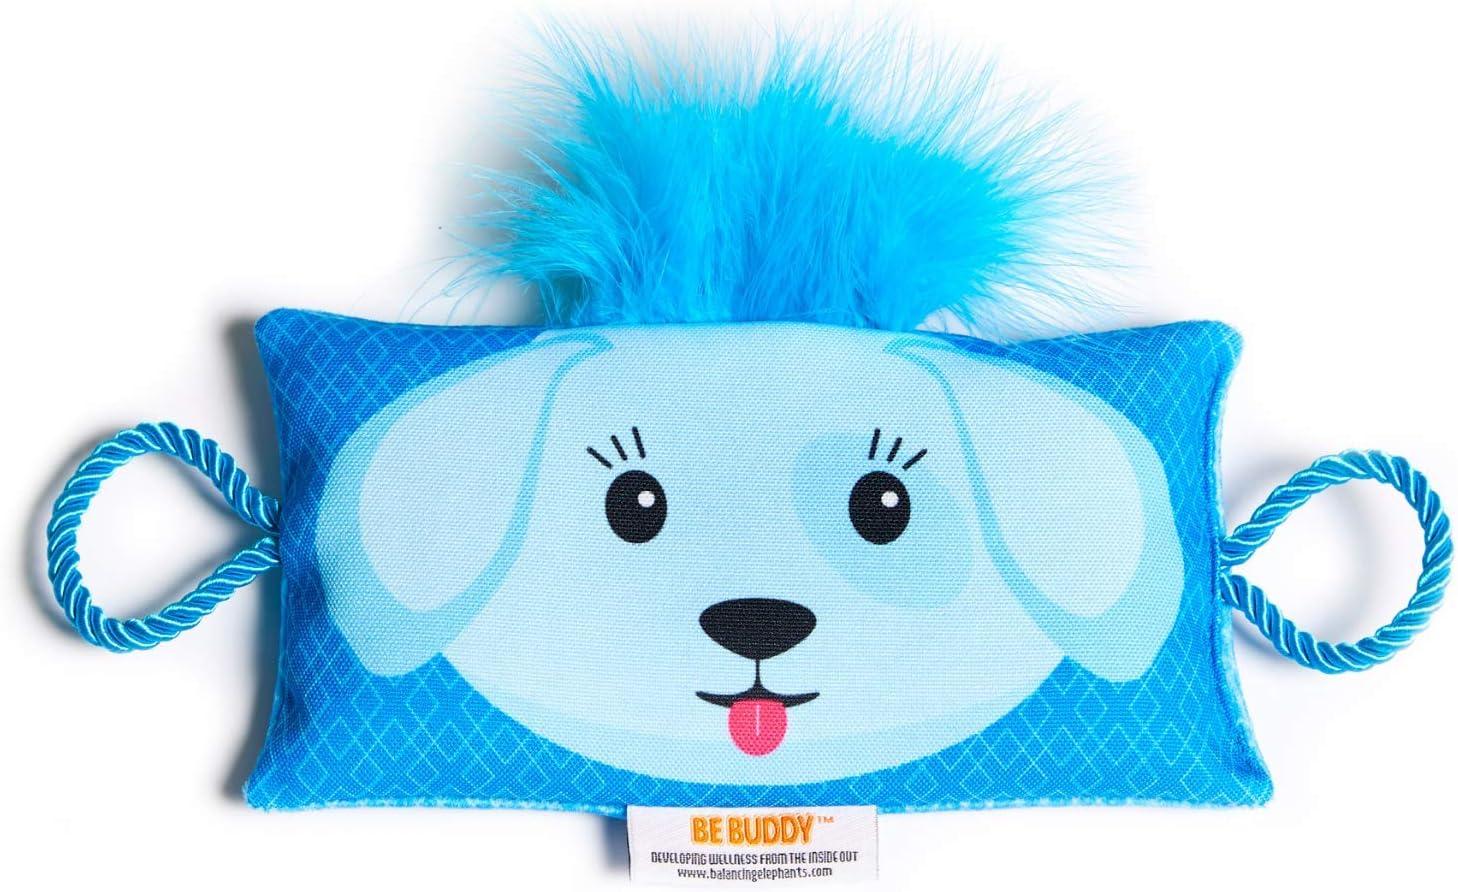 Sensory 35% OFF Toys for Kids- Cute Challenge the lowest price of Japan ☆ Balancing Stuffed Elephants- Animal-